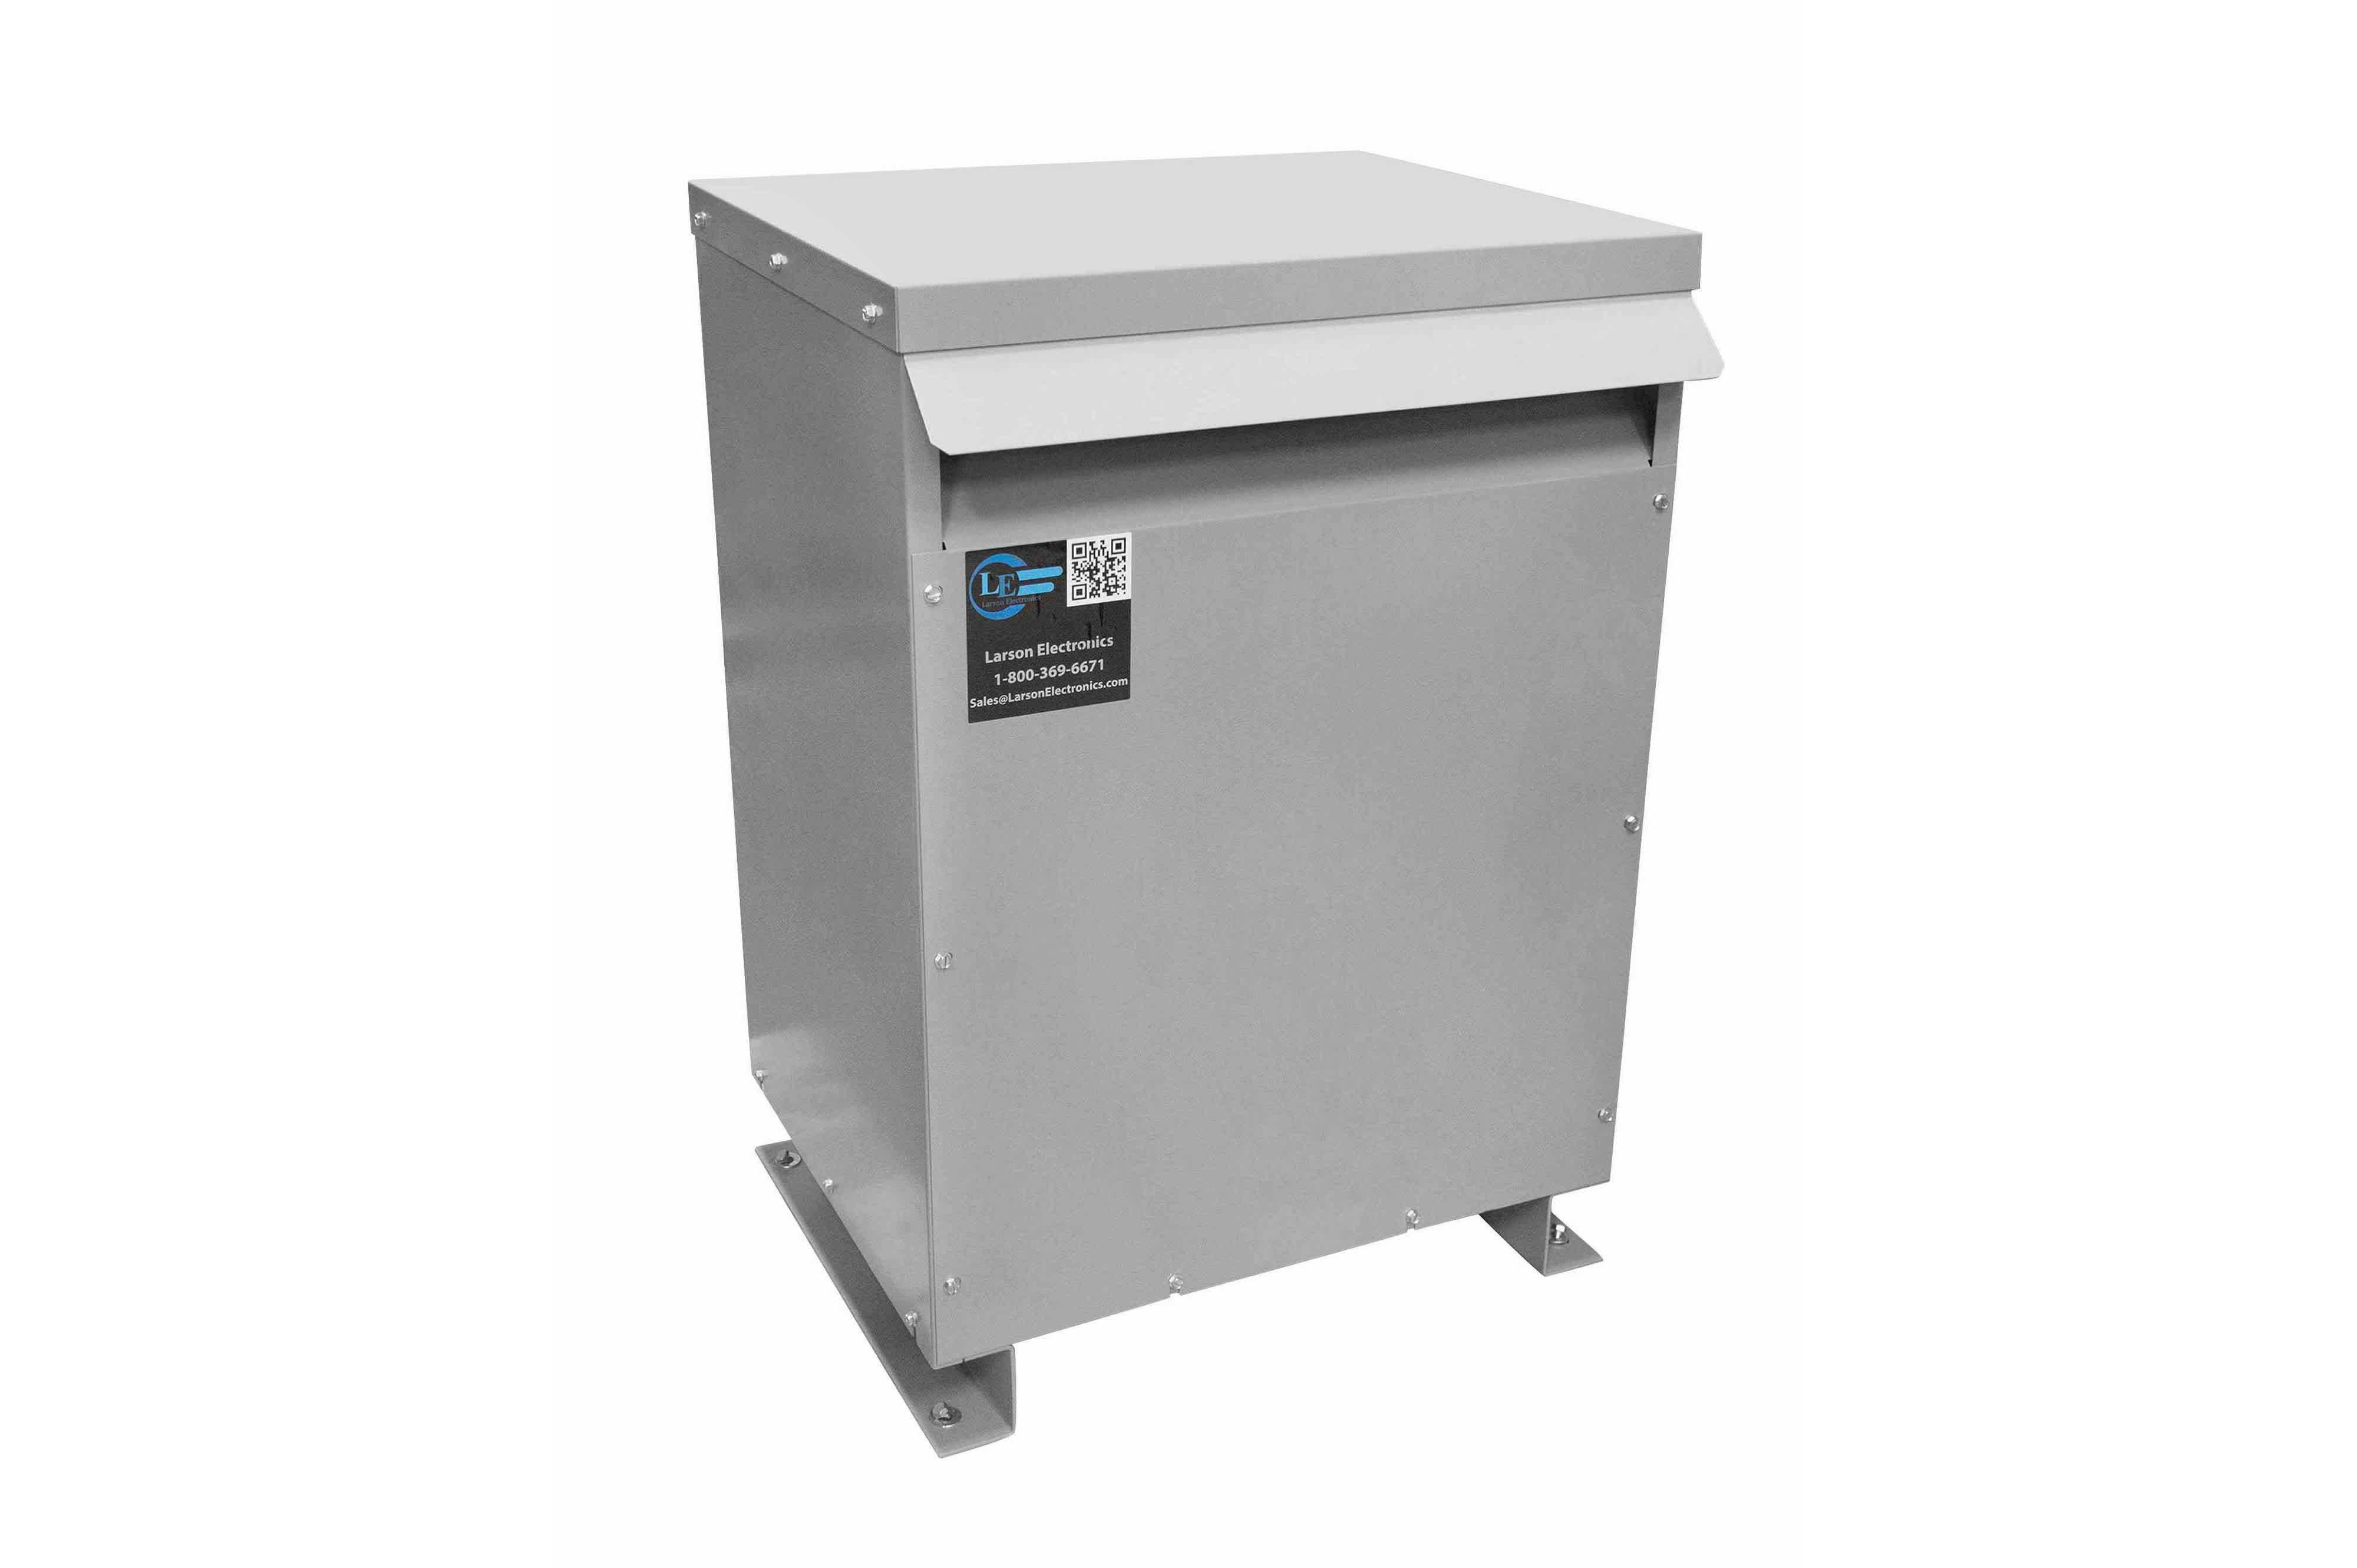 200 kVA 3PH Isolation Transformer, 460V Wye Primary, 600V Delta Secondary, N3R, Ventilated, 60 Hz